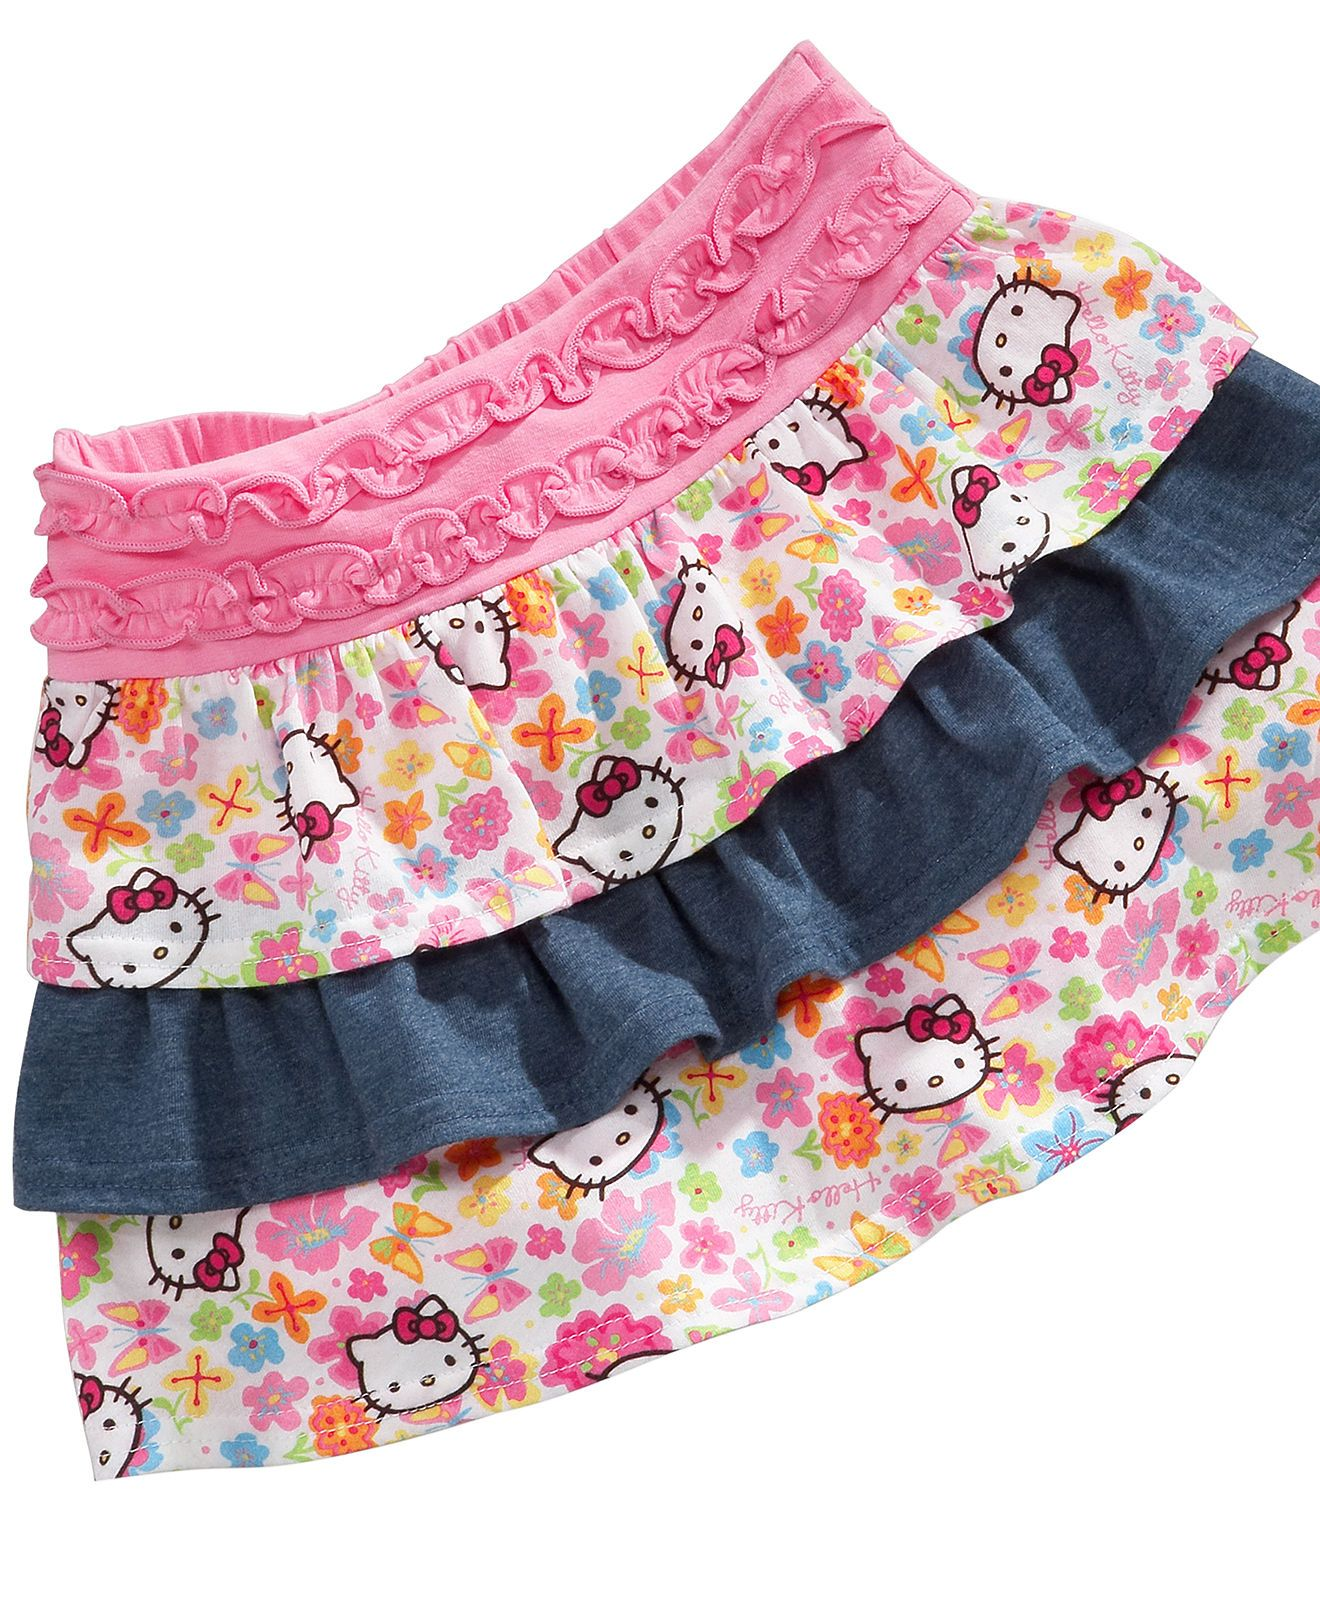 Hello Kitty Skirt for my children one day haha